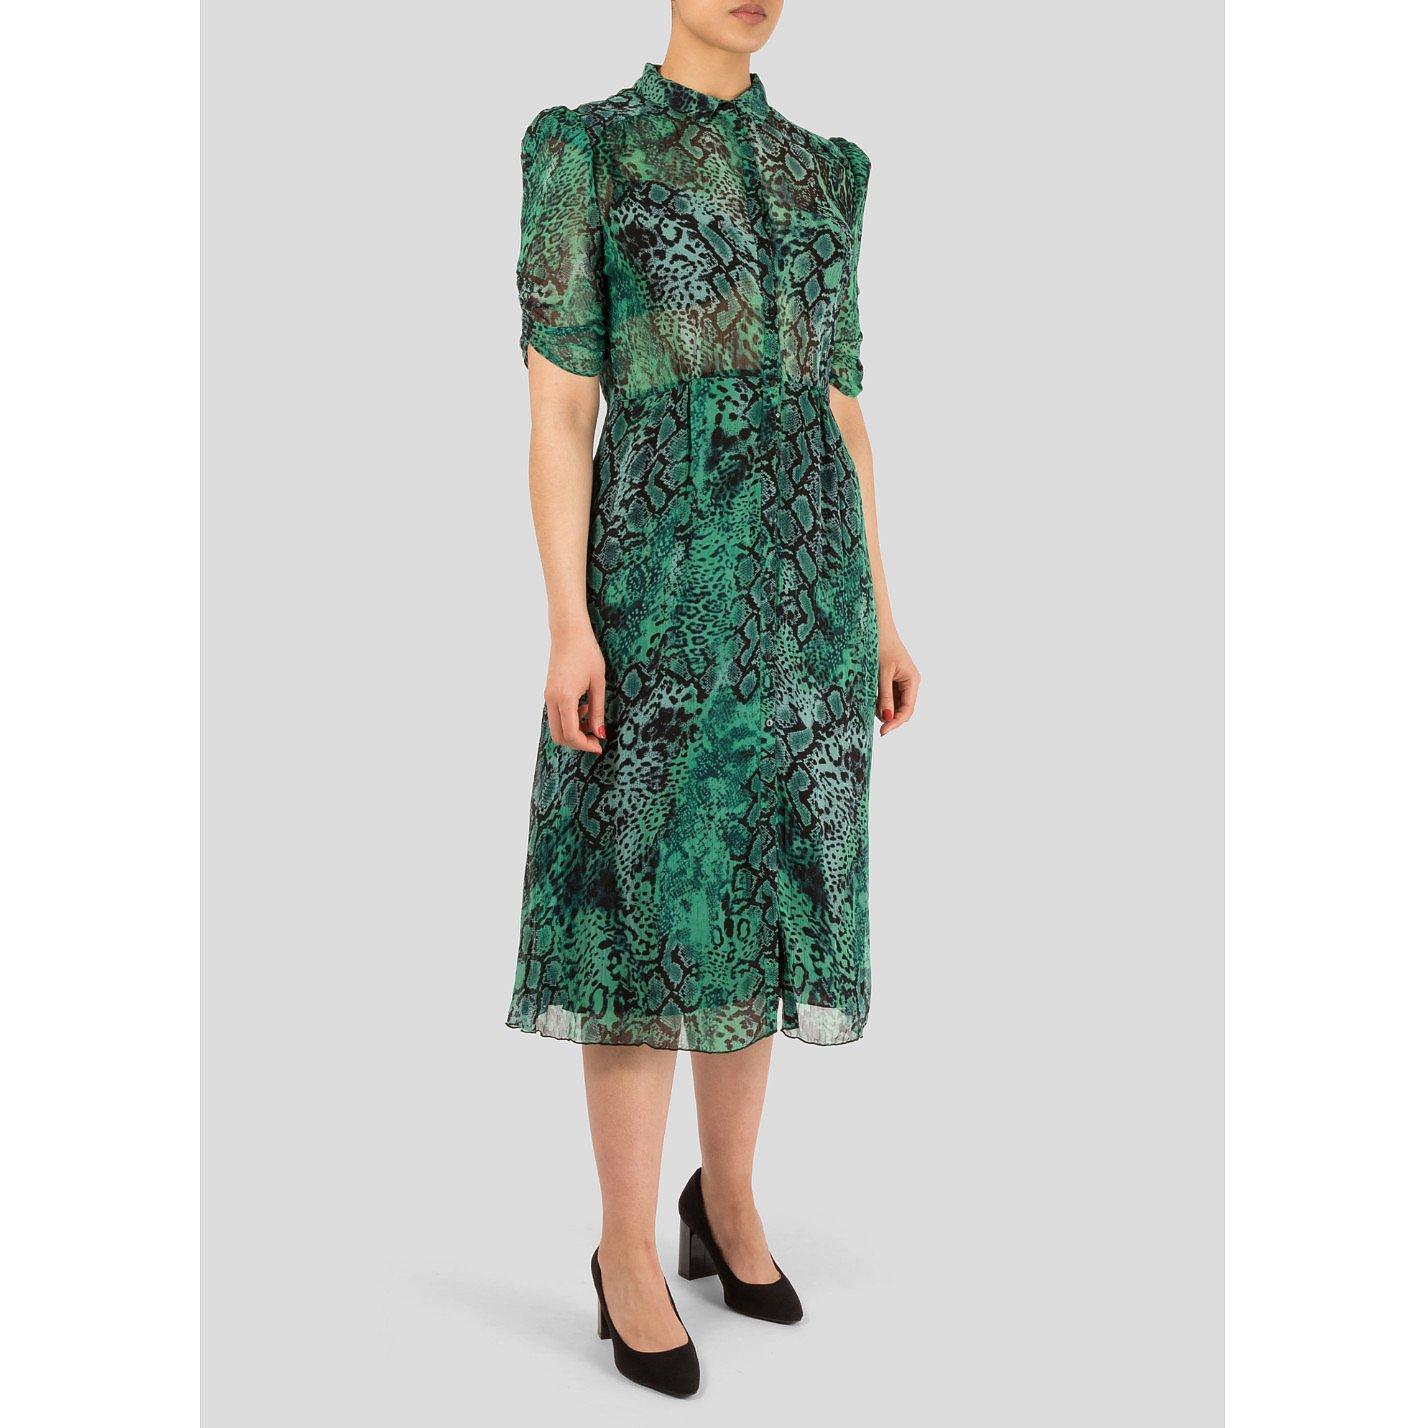 BA&SH Rozy Snakeskin-Print Chiffon Dress